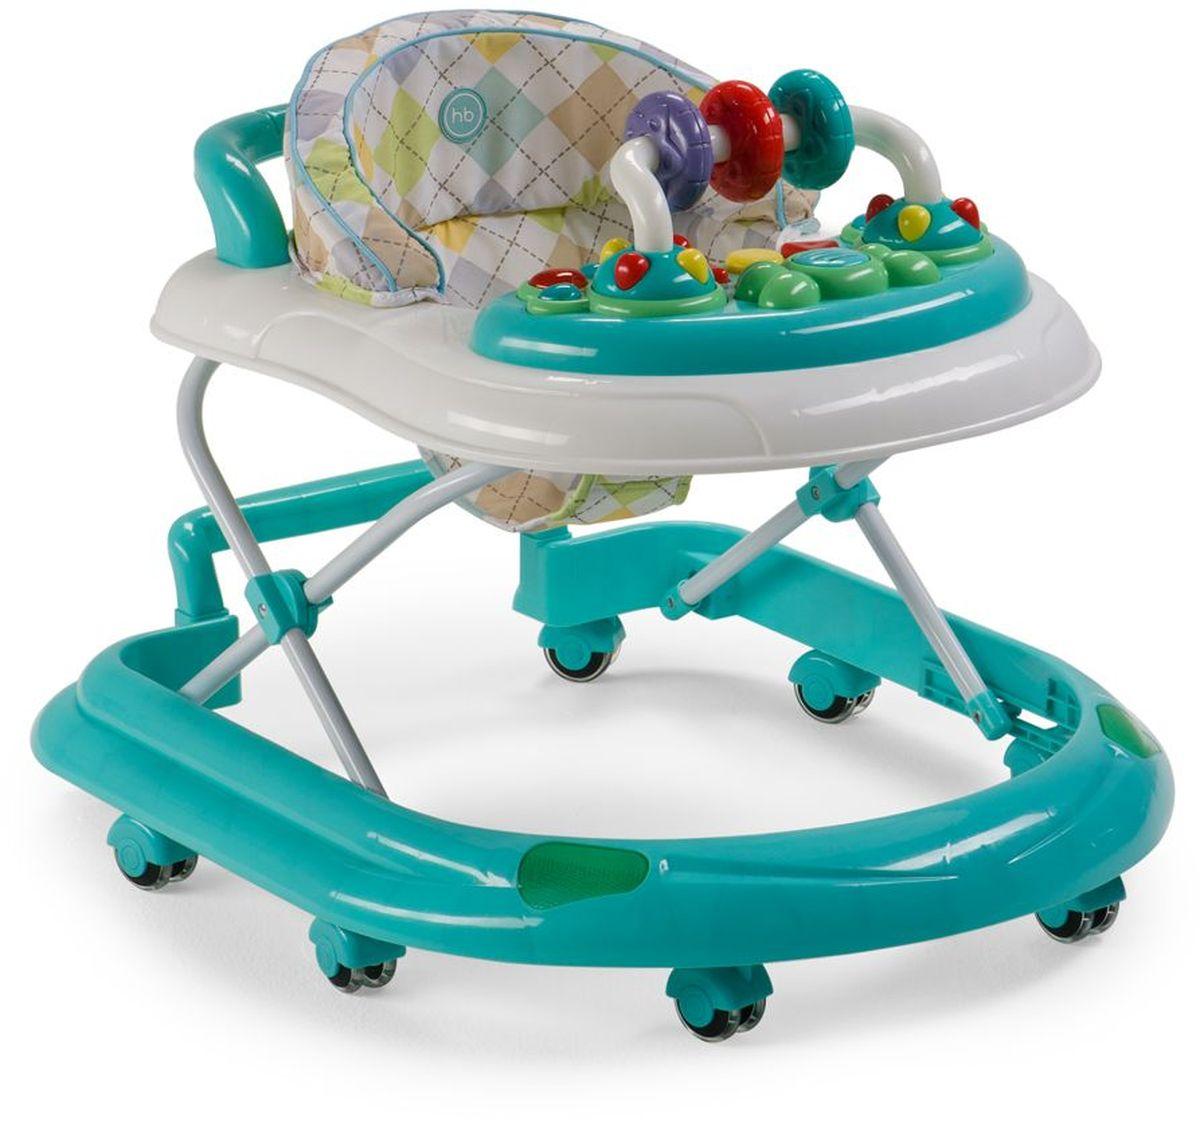 Happy Baby Ходунки Smiley V2 цвет голубой - Ходунки, прыгунки, качалки